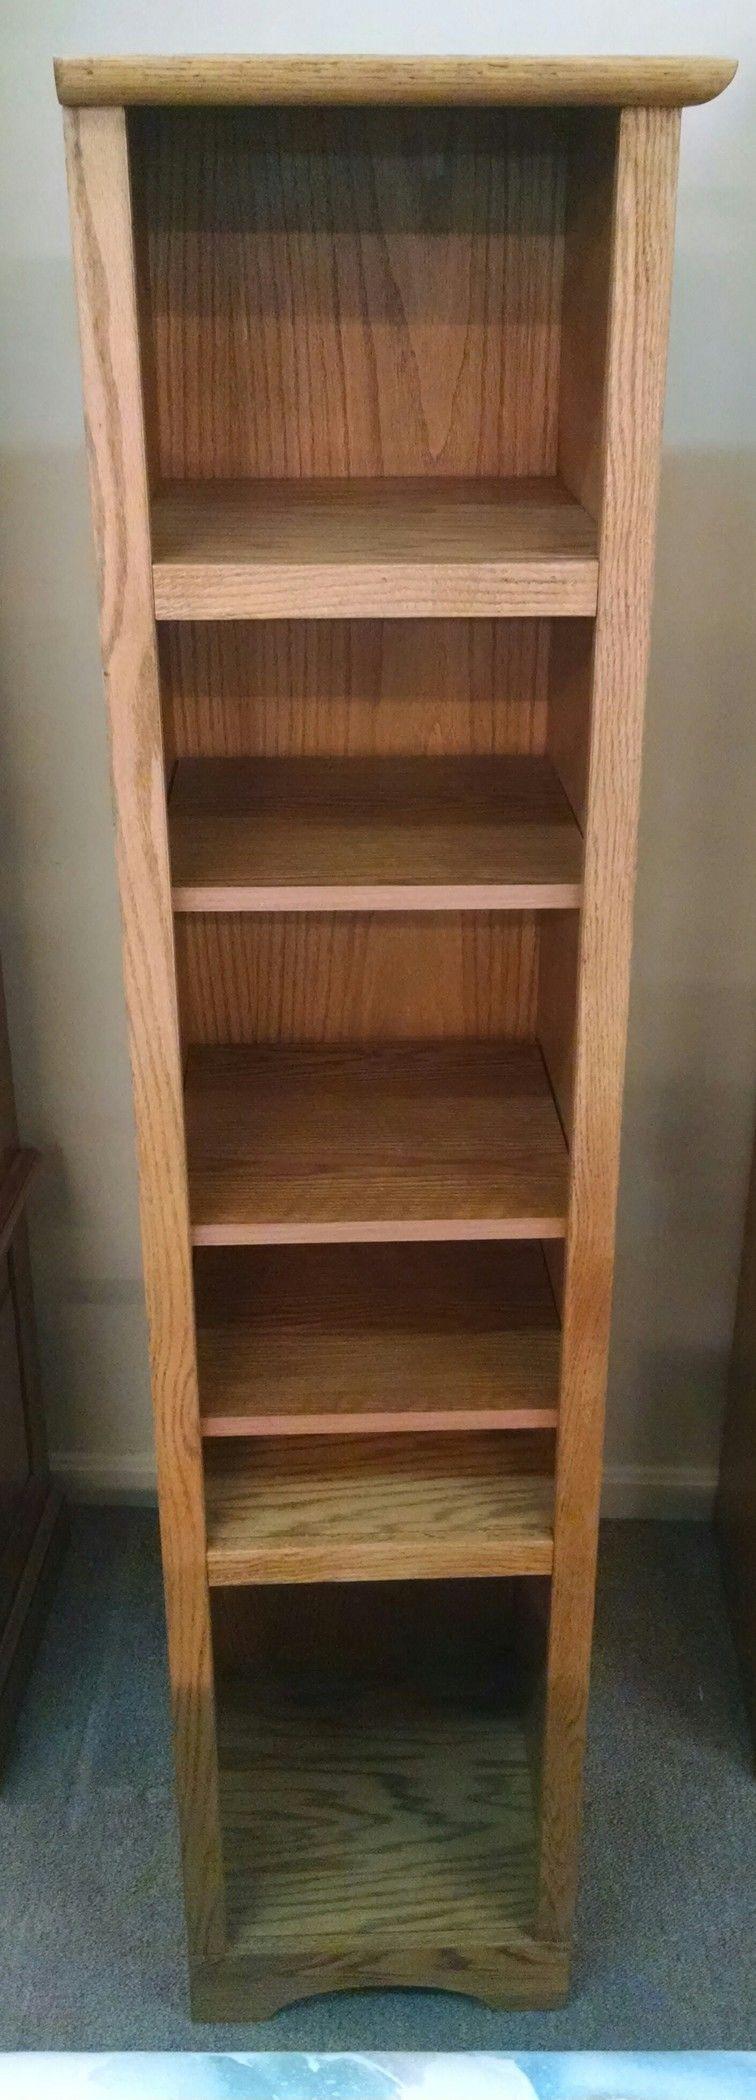 Tall Thin Bookcase 6 Shelves